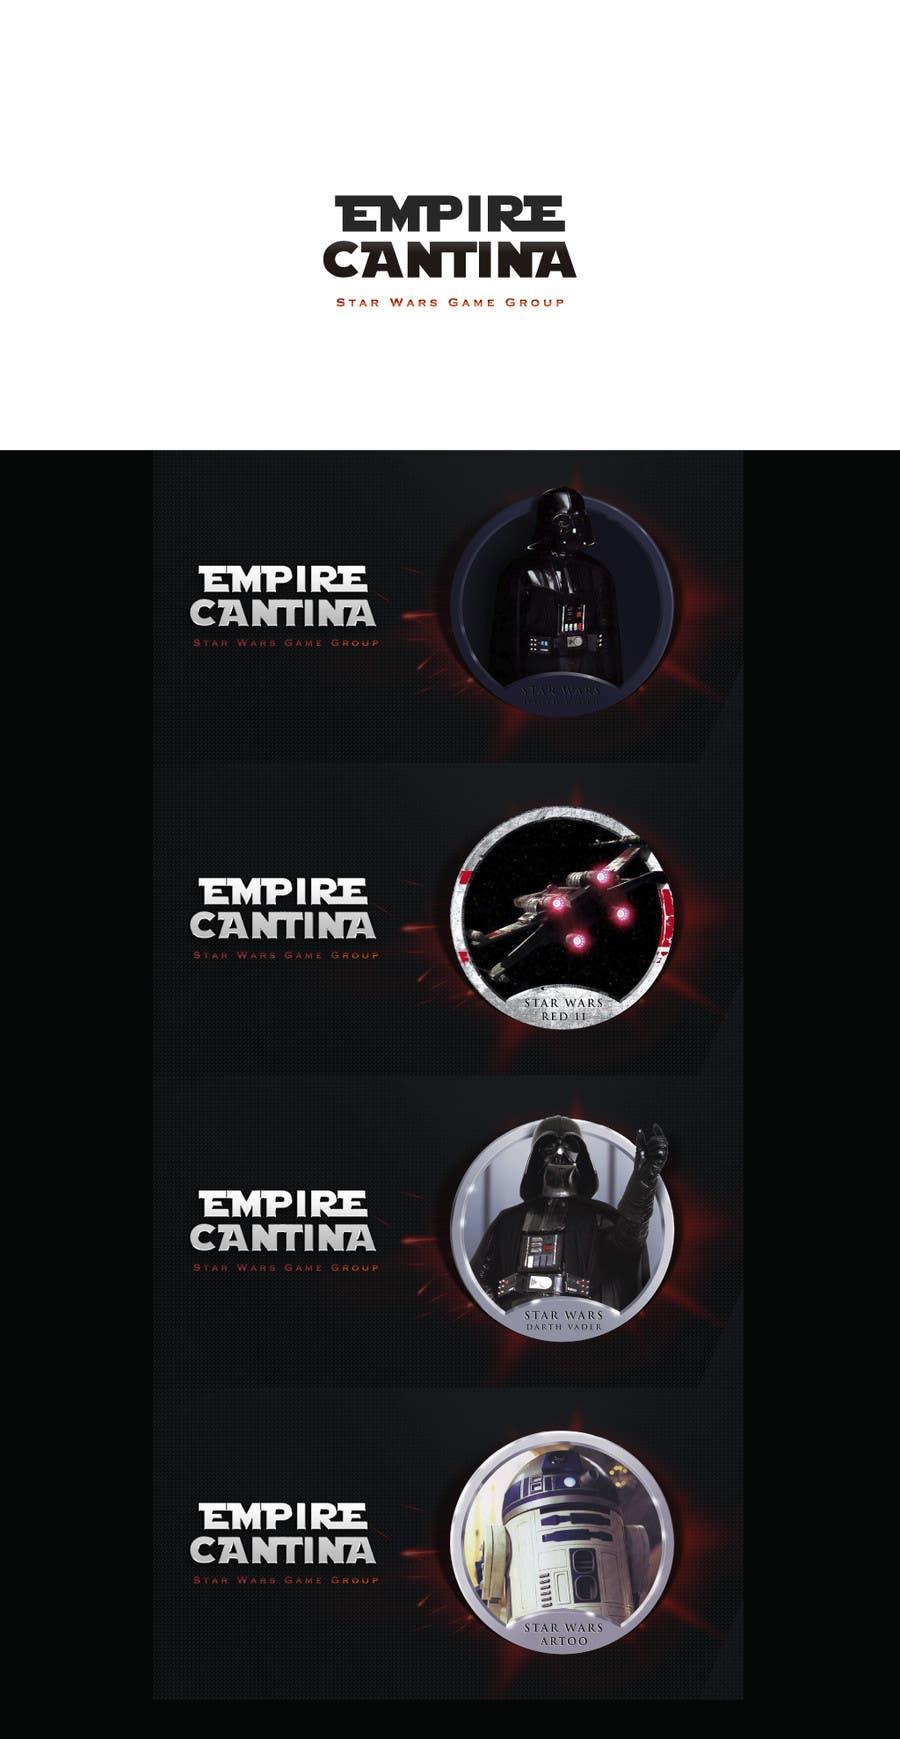 Proposition n°11 du concours Star Wars Game Group Logo Design